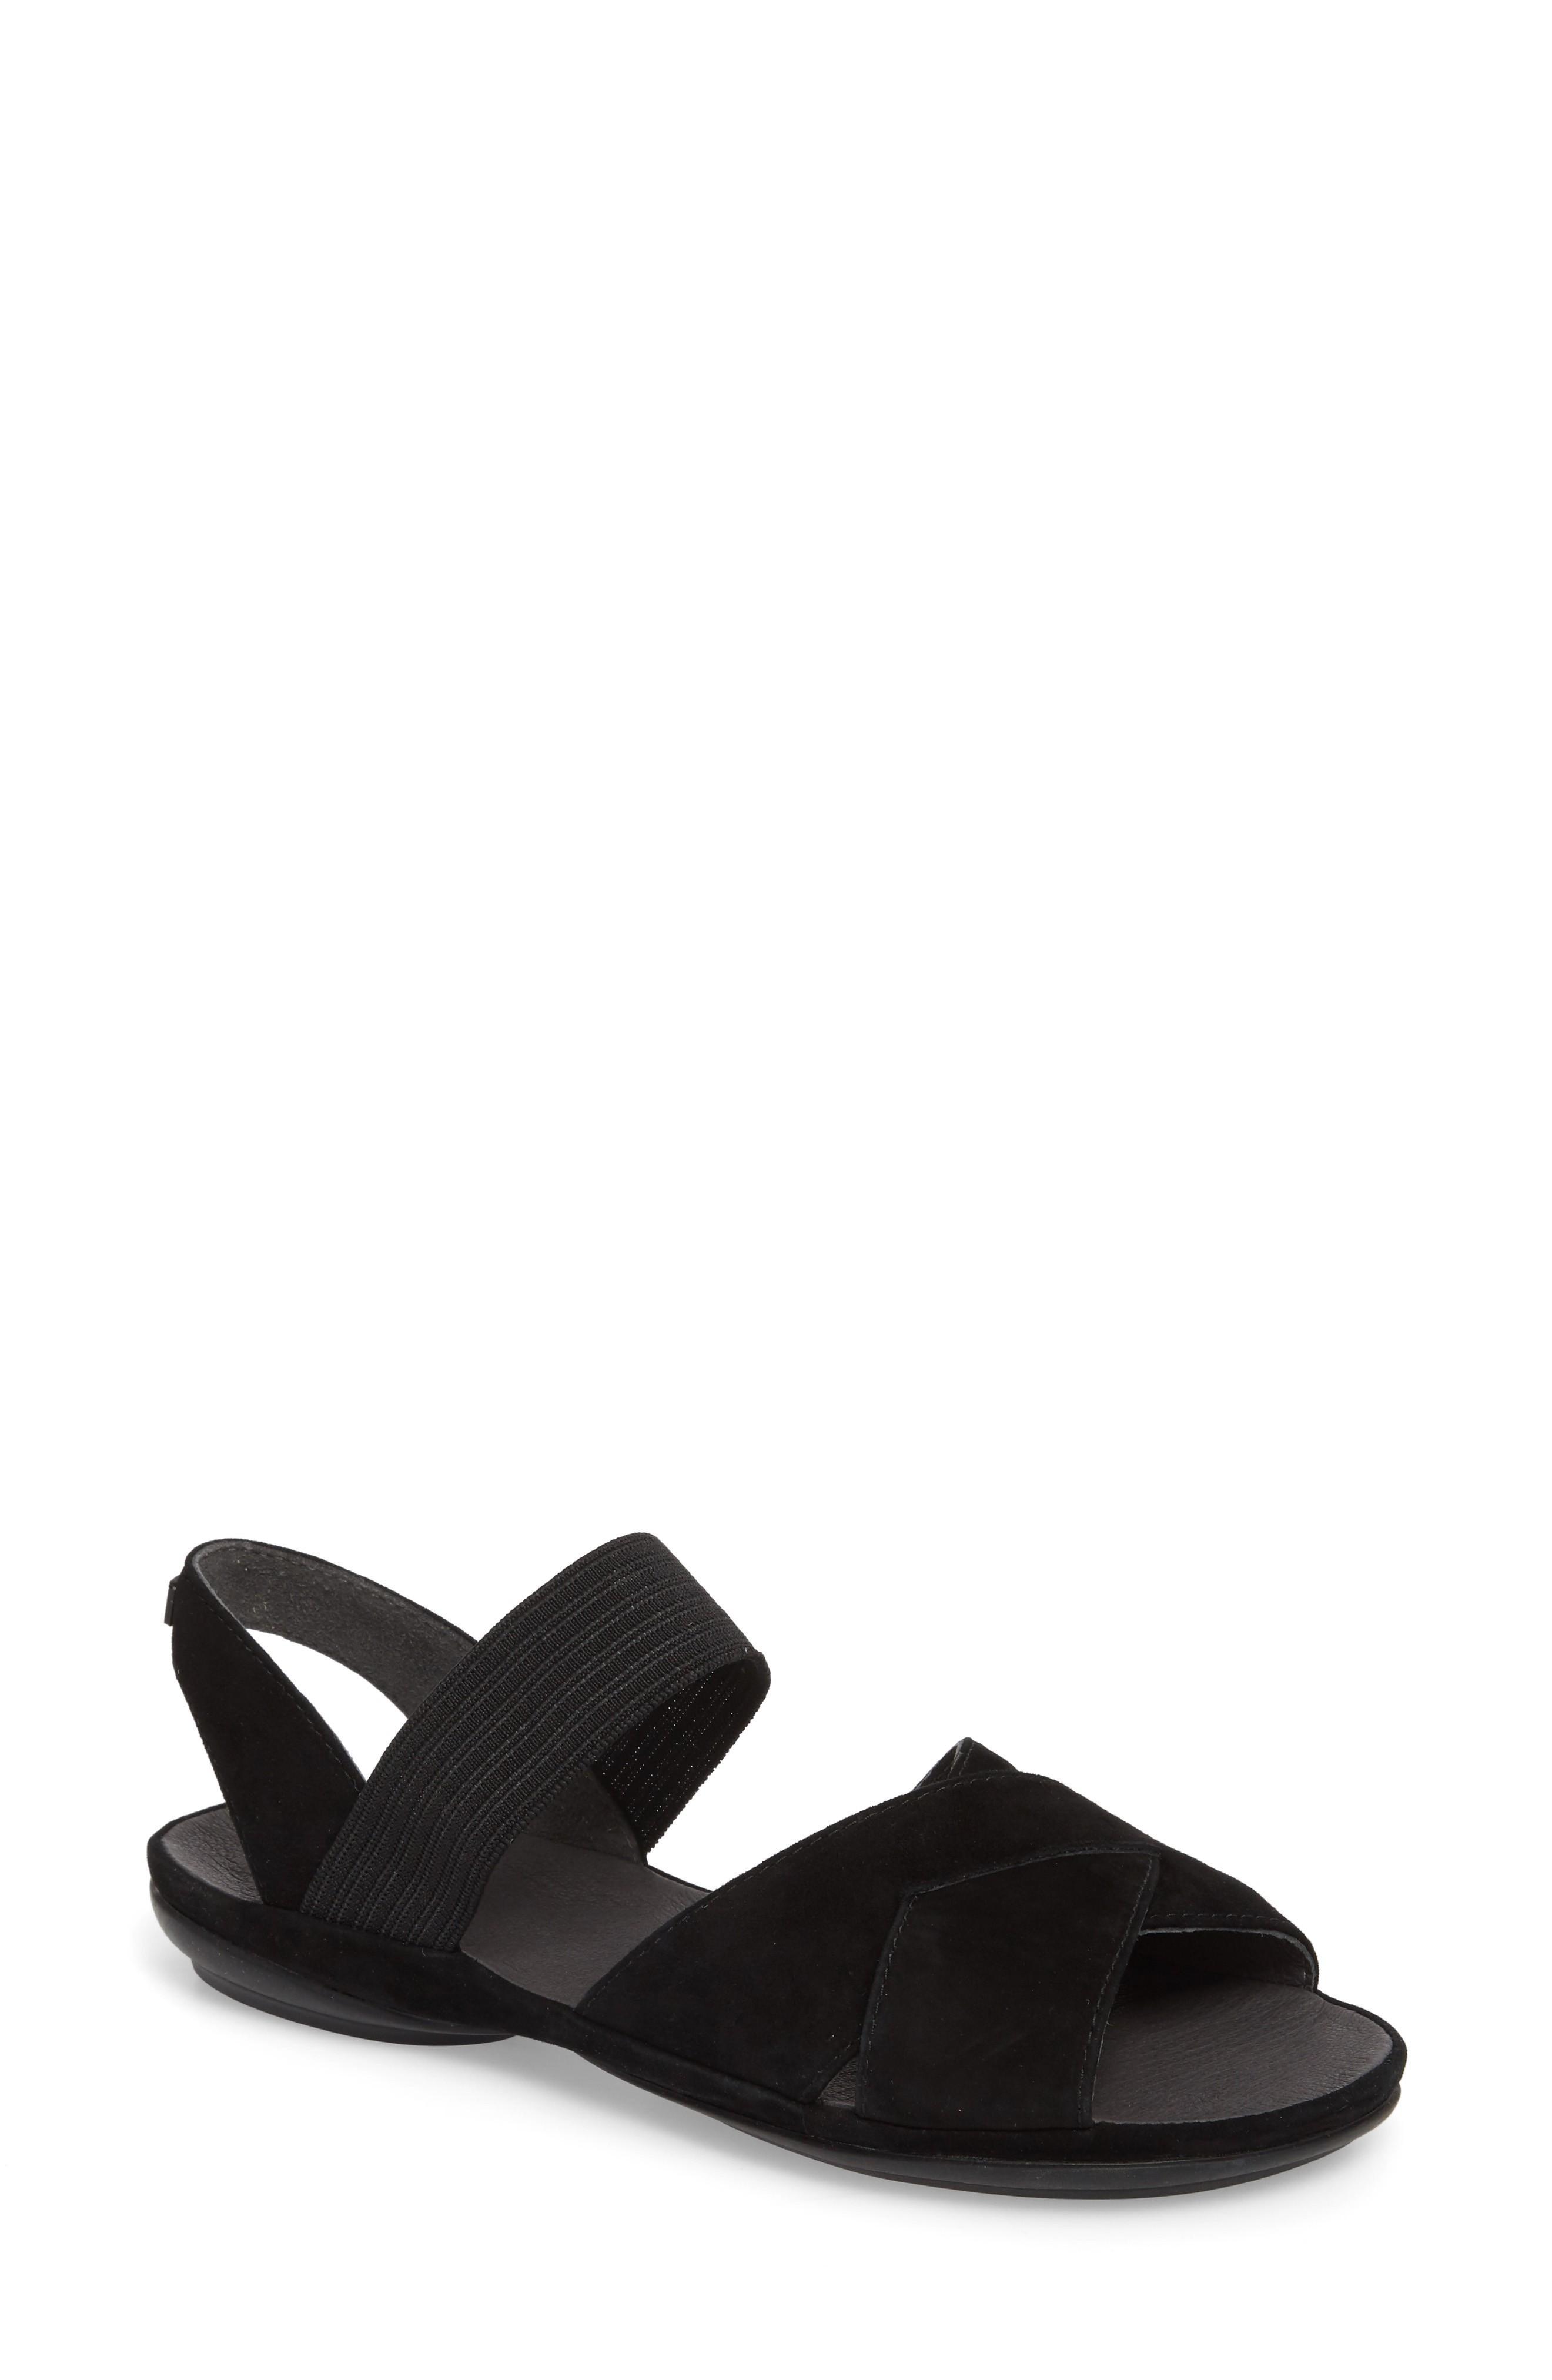 Camper Right Nina Flat Cross Strap Sandal In Black Leather